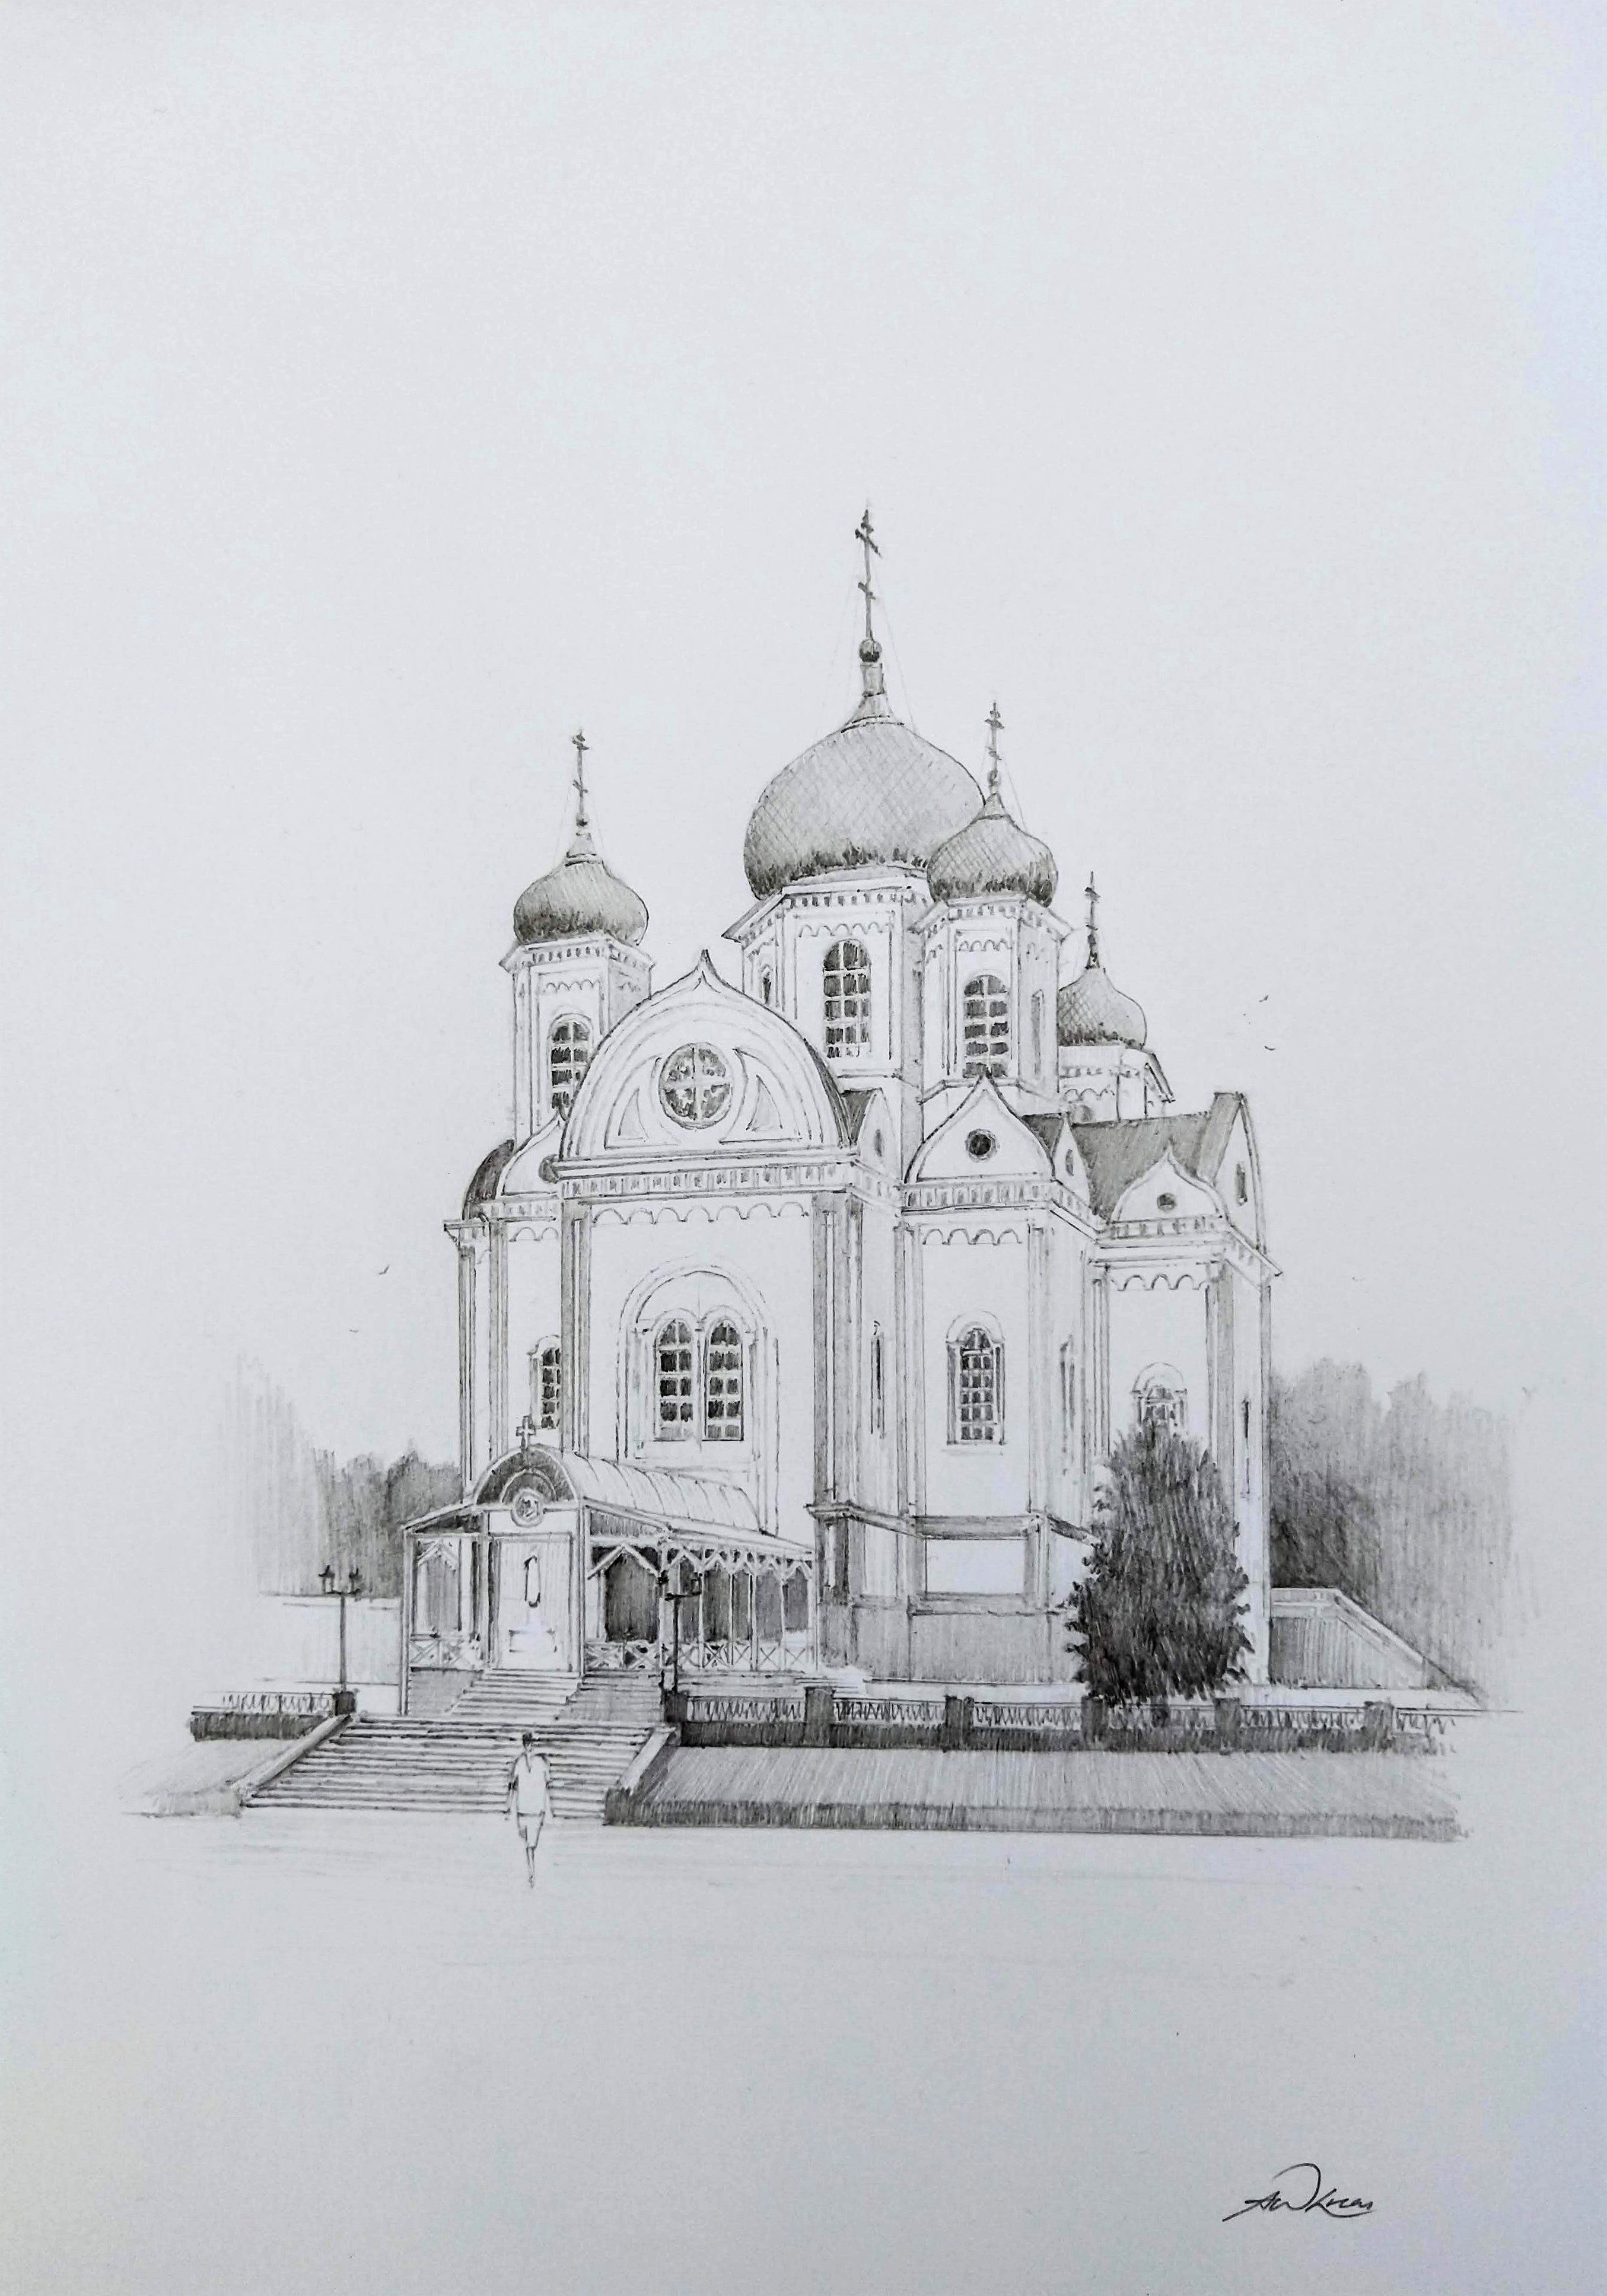 Alexander Nevsky Cathedral in Krasnodar.